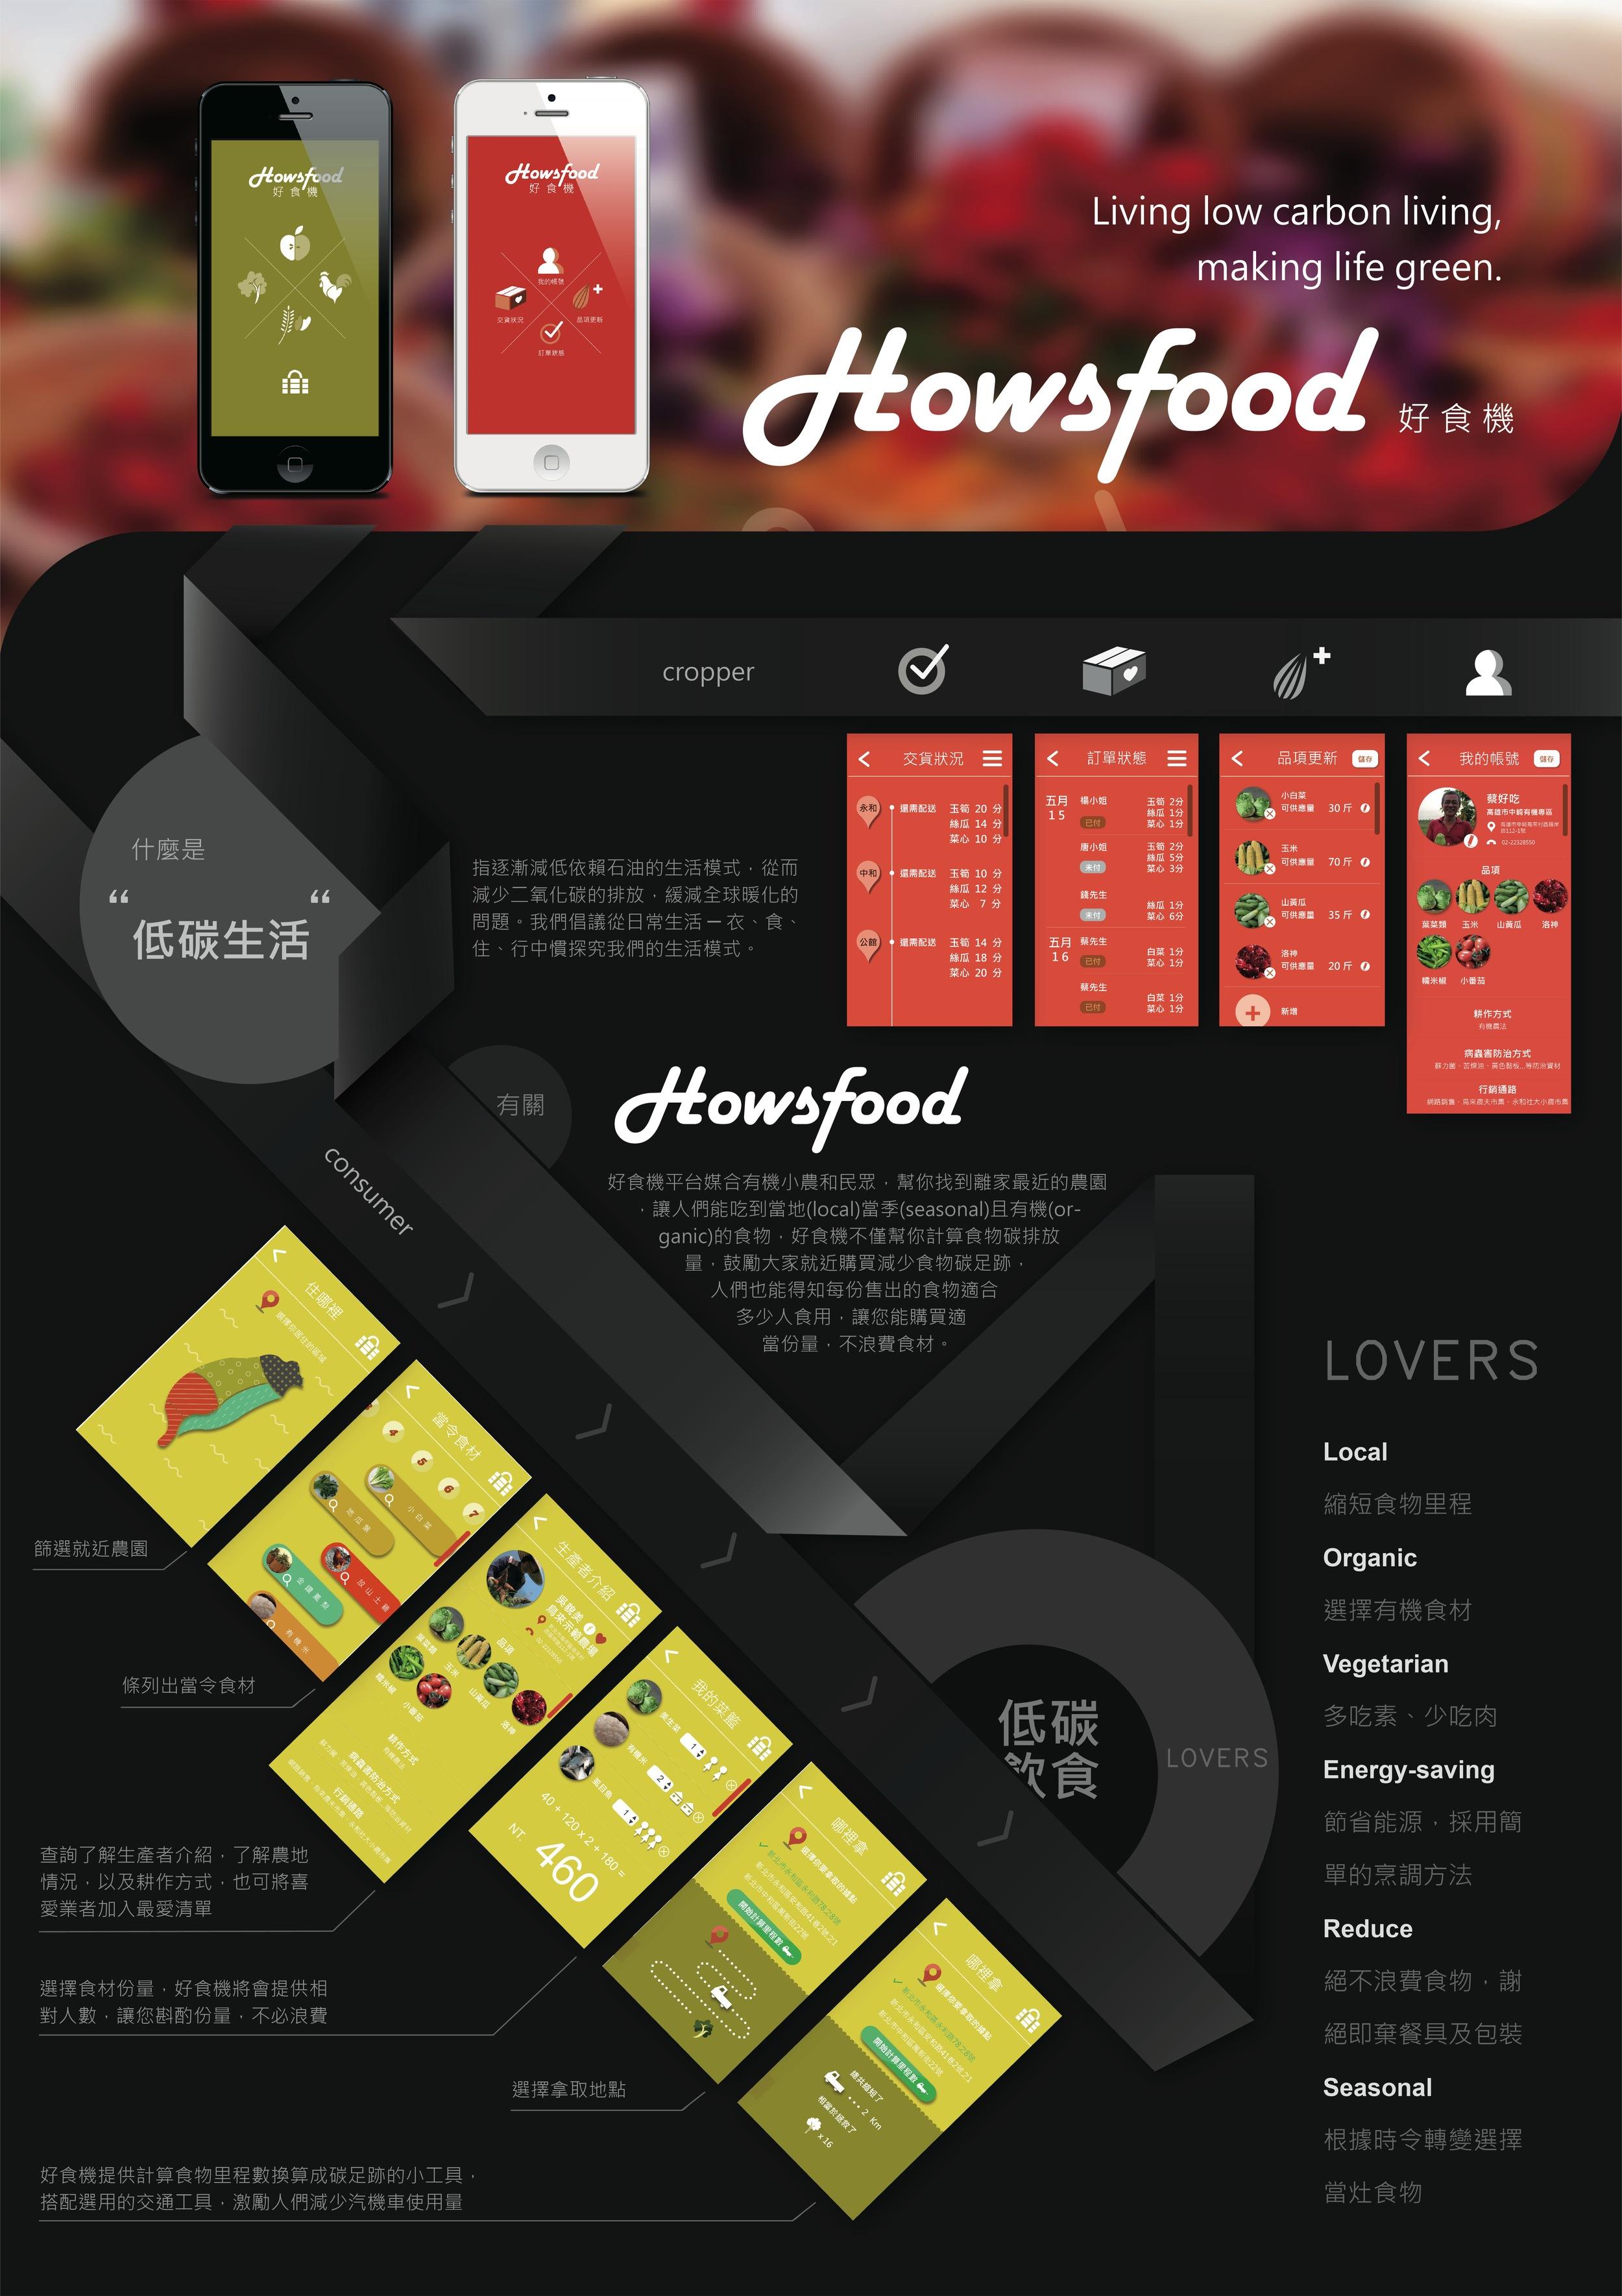 * Howsfood app_B10034014_李昀叡.jpg